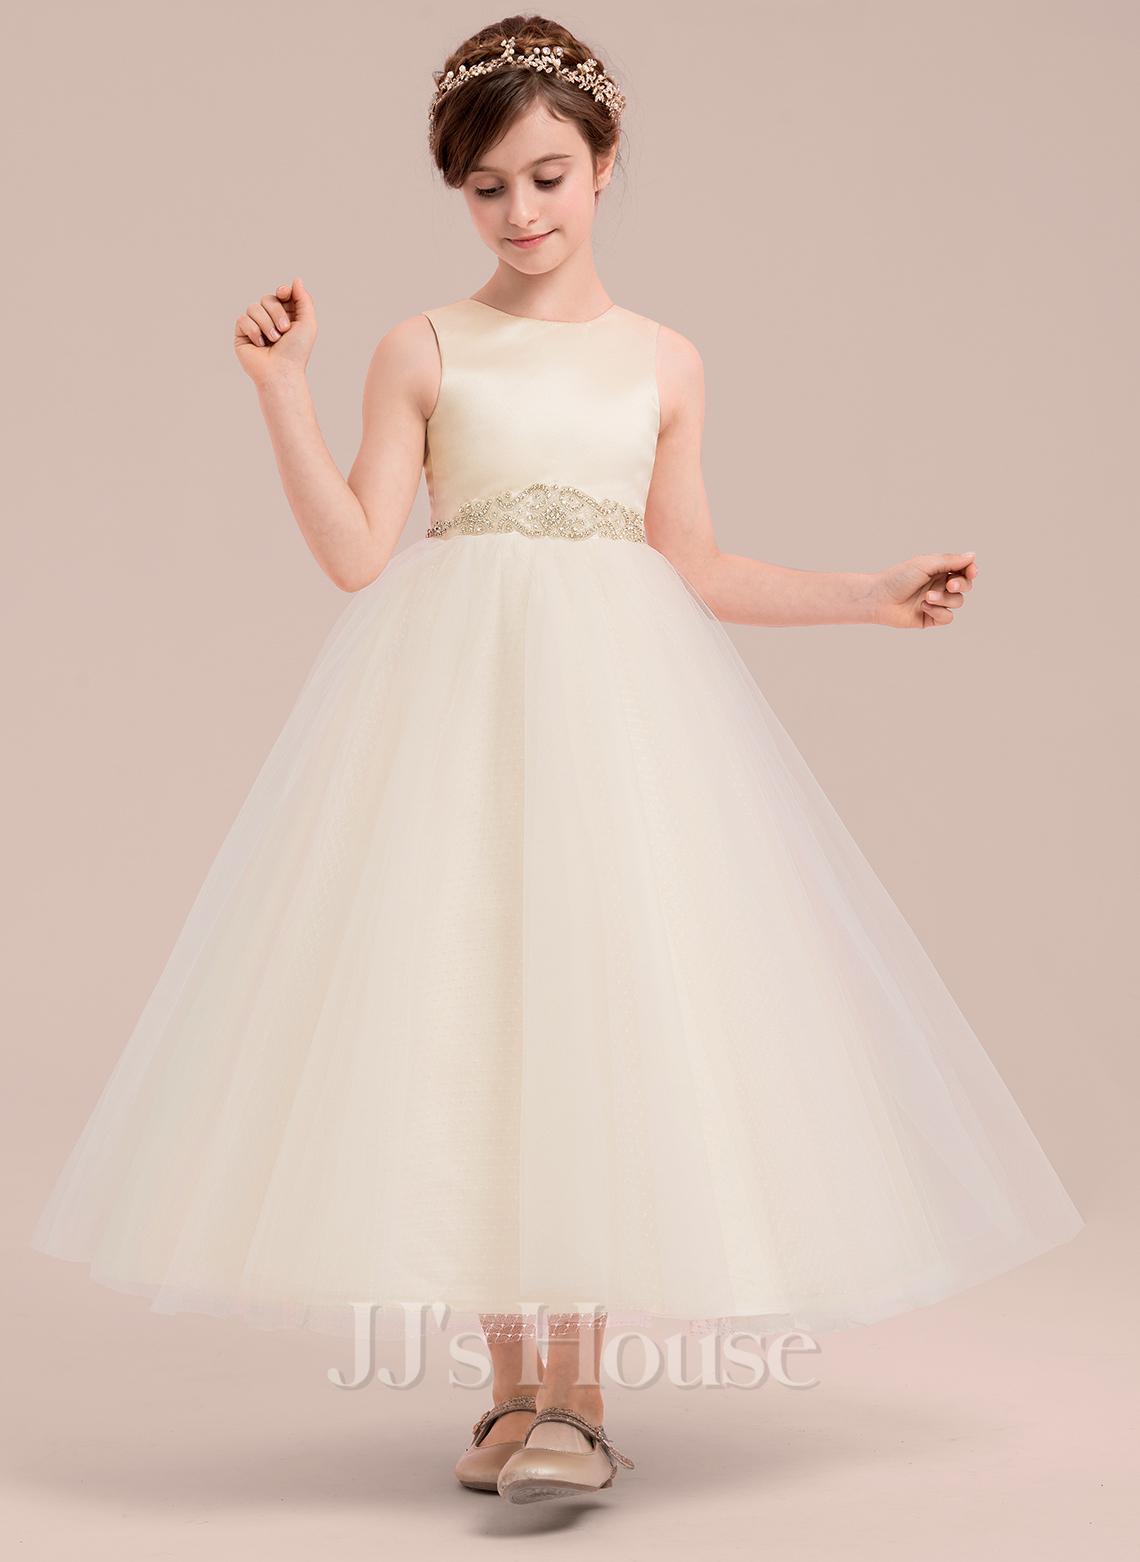 A-Line Ankle-length Flower Girl Dress - Satin/Tulle Sleeveless Scoop Neck With Beading